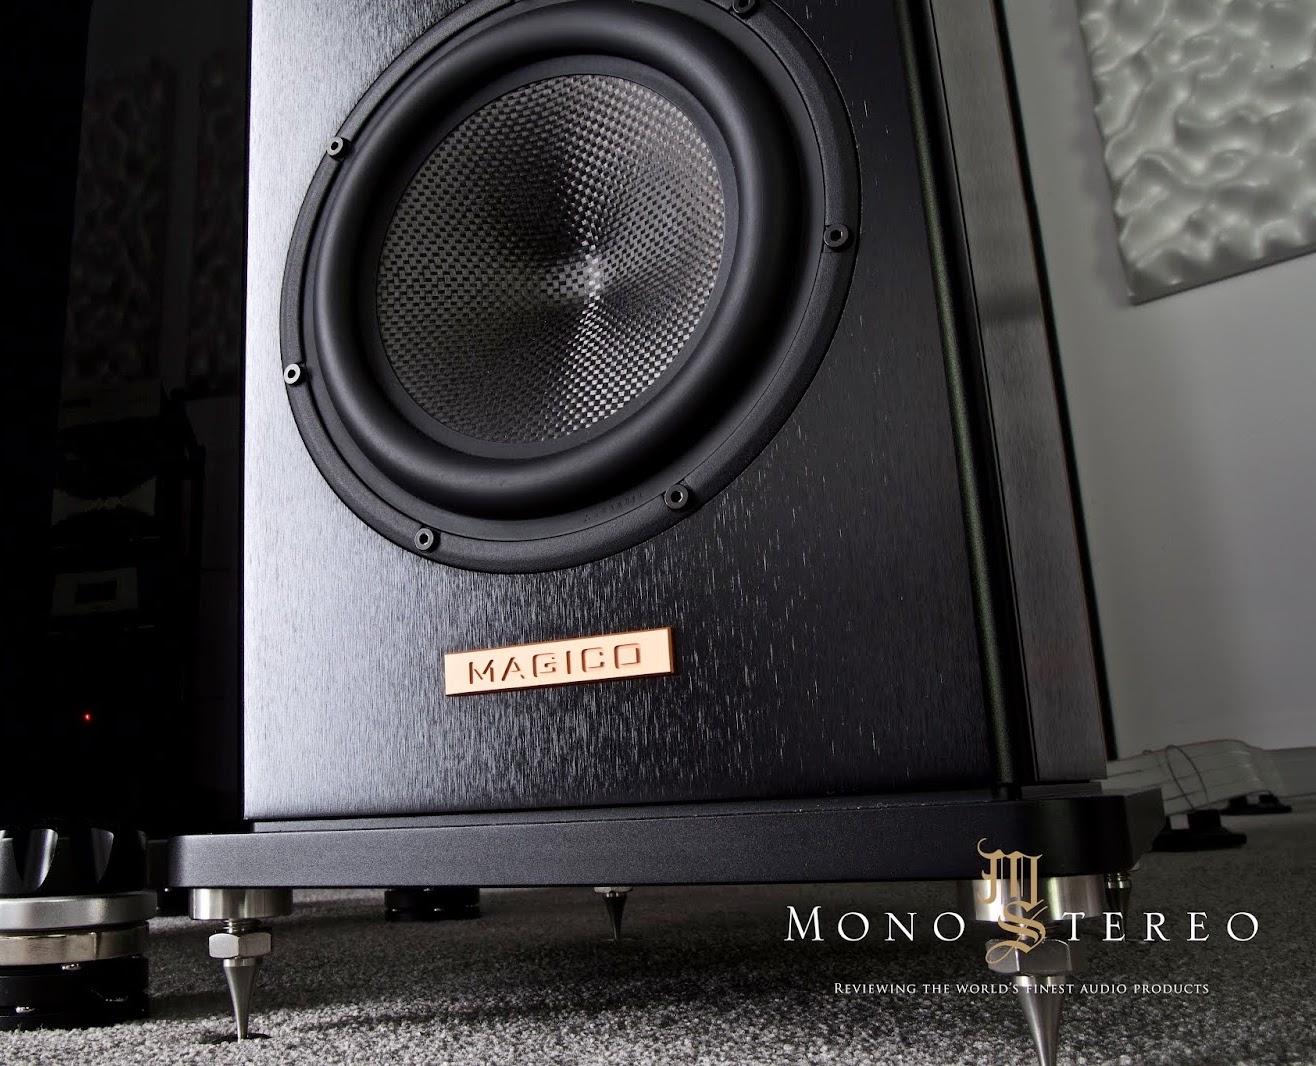 MAGICO A3 floorstand speakers w grills 22Hz-50kHz 88dB 4ohm